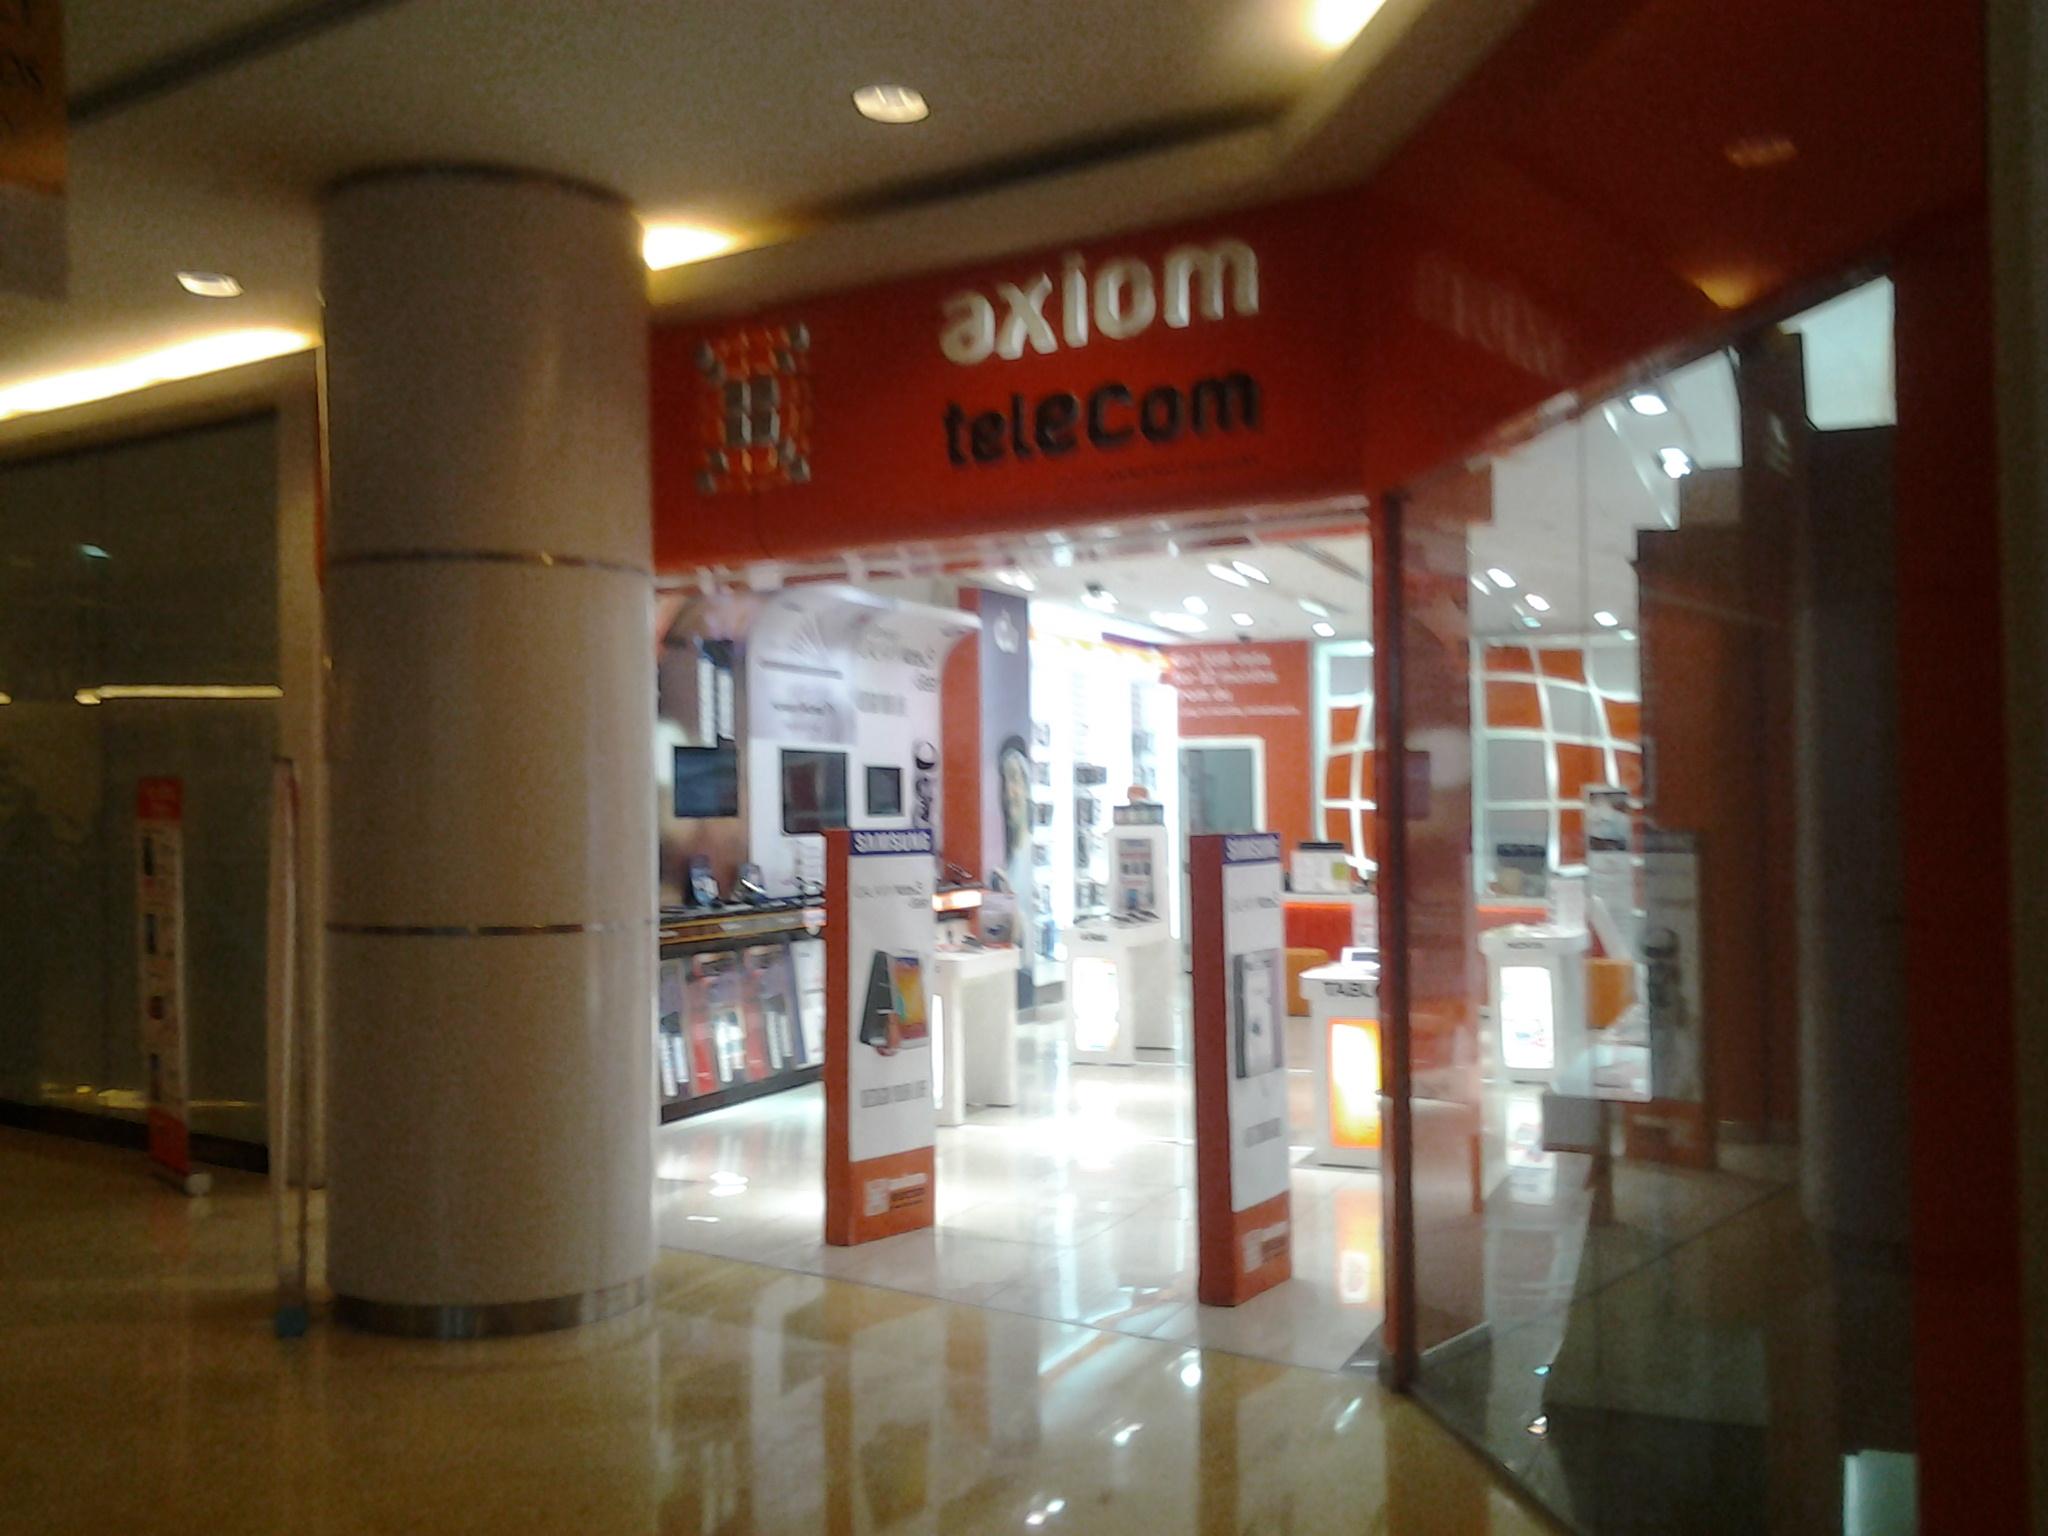 eDurar: Axiom Telecom